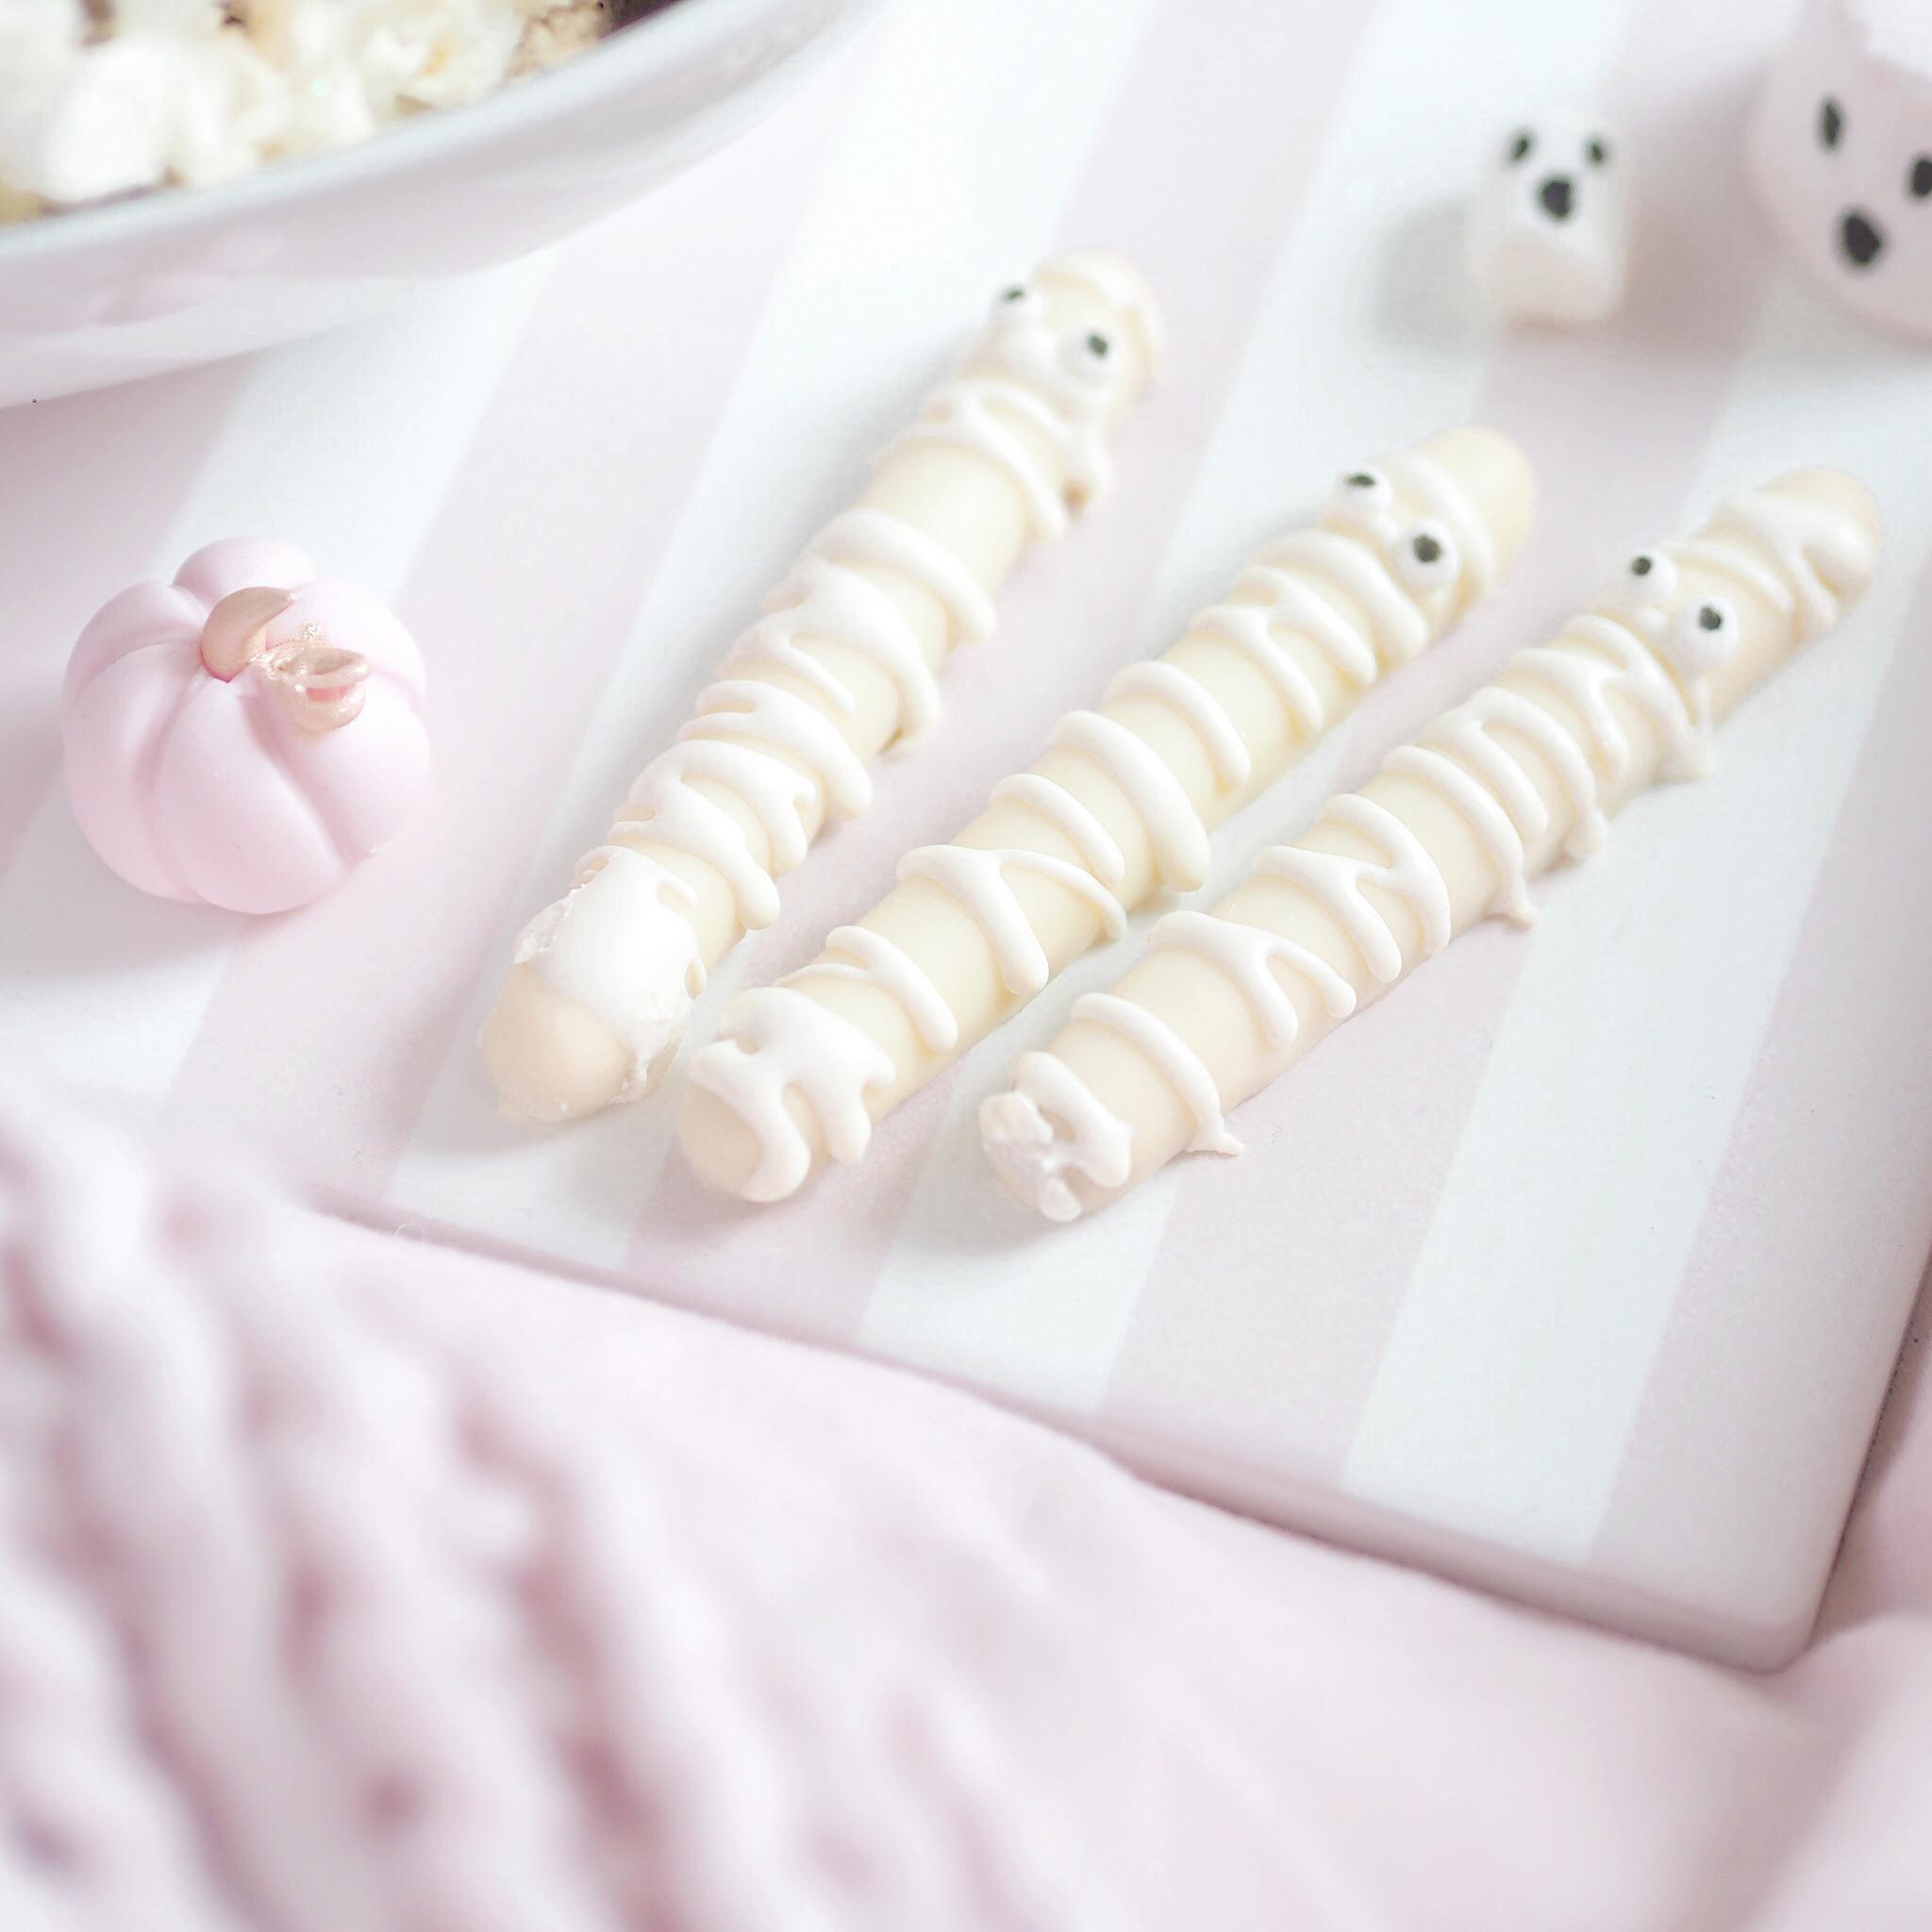 Mummified White Chocolate Fingers   A Girly Halloween Movie Night With 3 Easy Treats